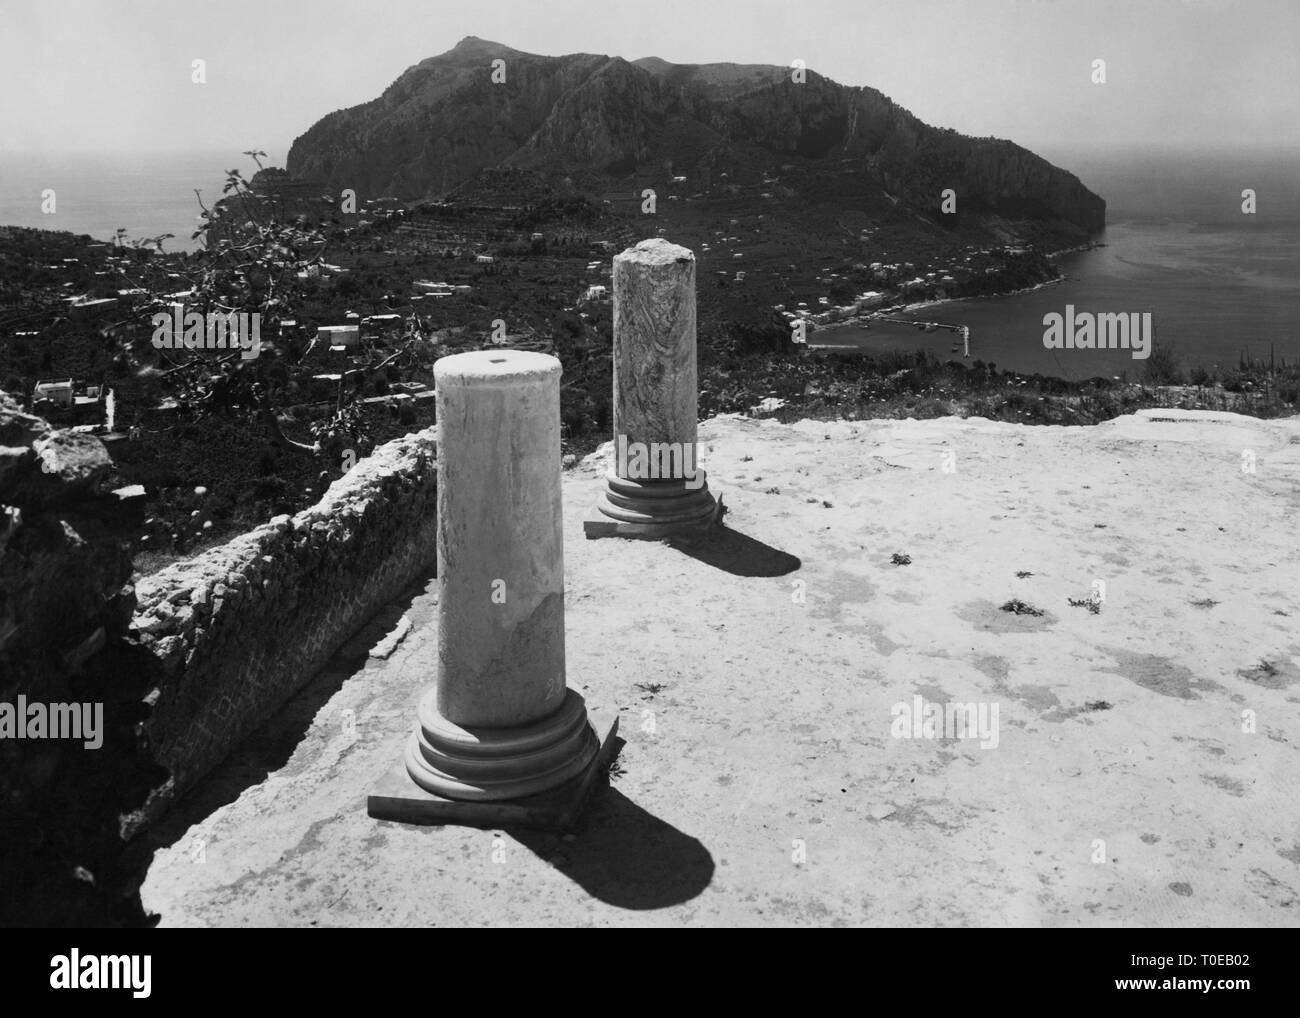 villa jovis, monte tiberio, capri island, campania, italy 1930-40 Stock Photo